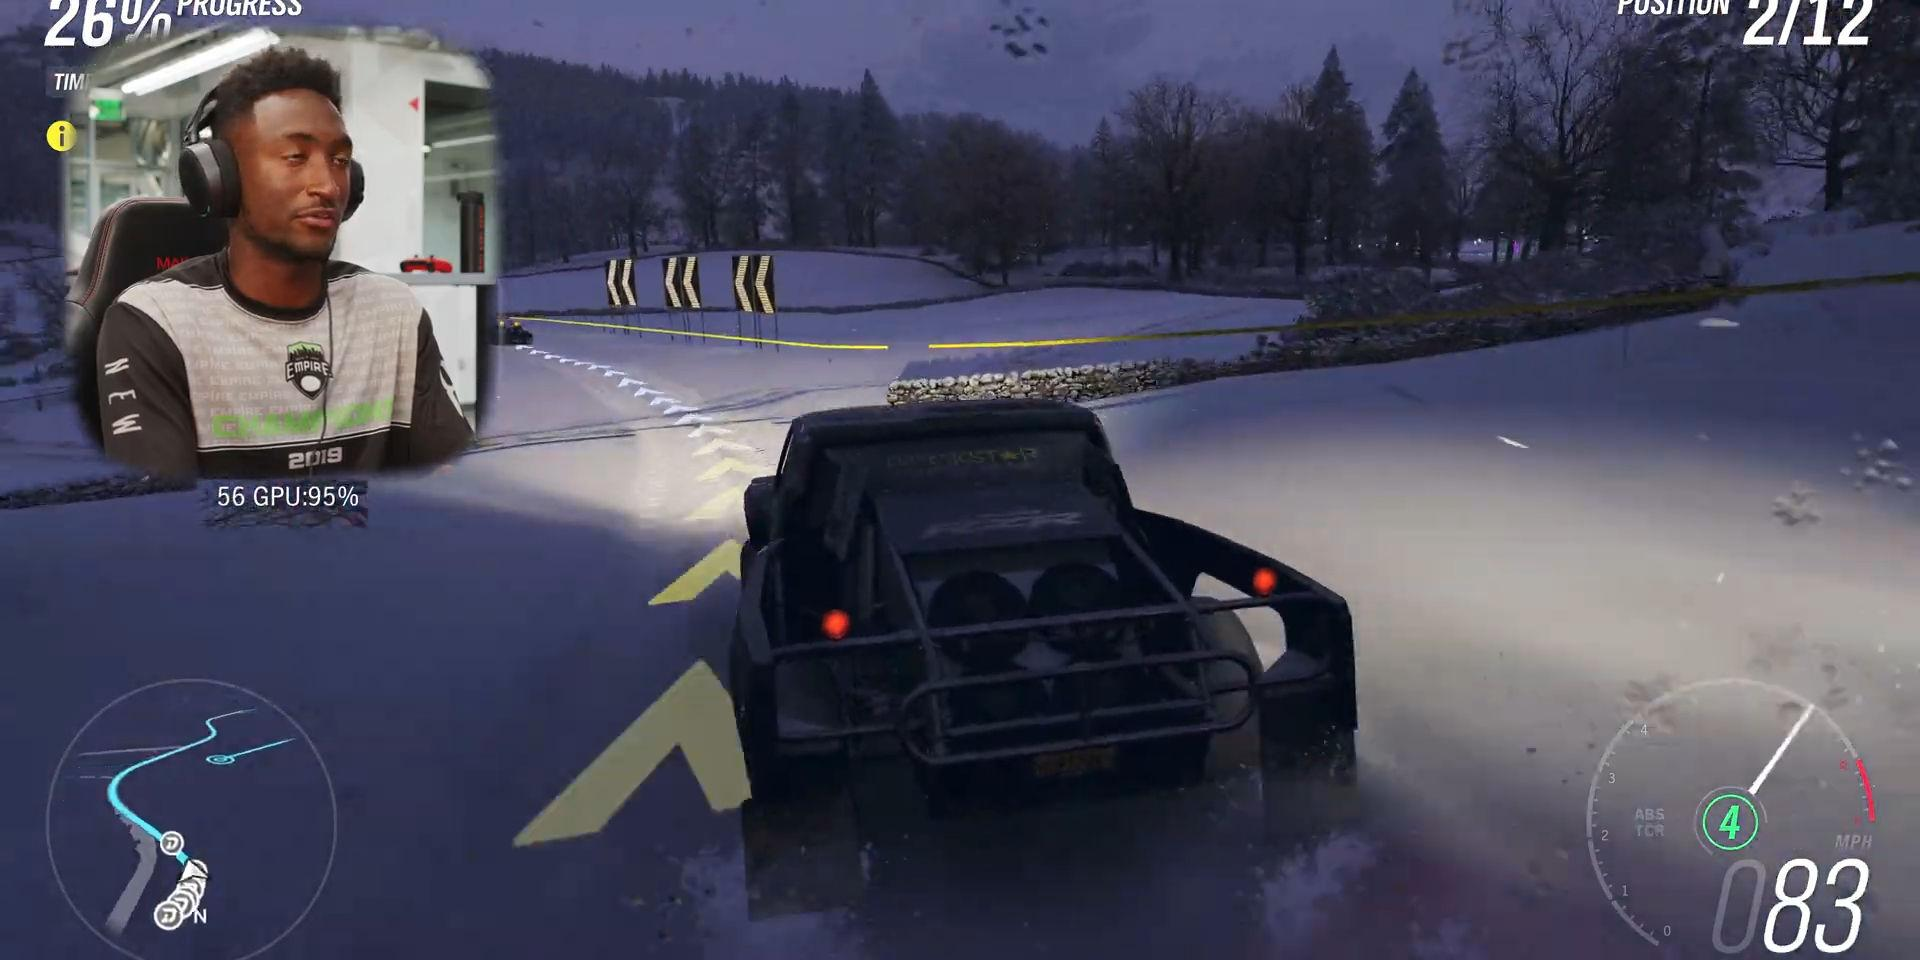 Nvidia Geforce Rtx 3090 8k Gameplay Brownlee Forza Horizon 4 (2)